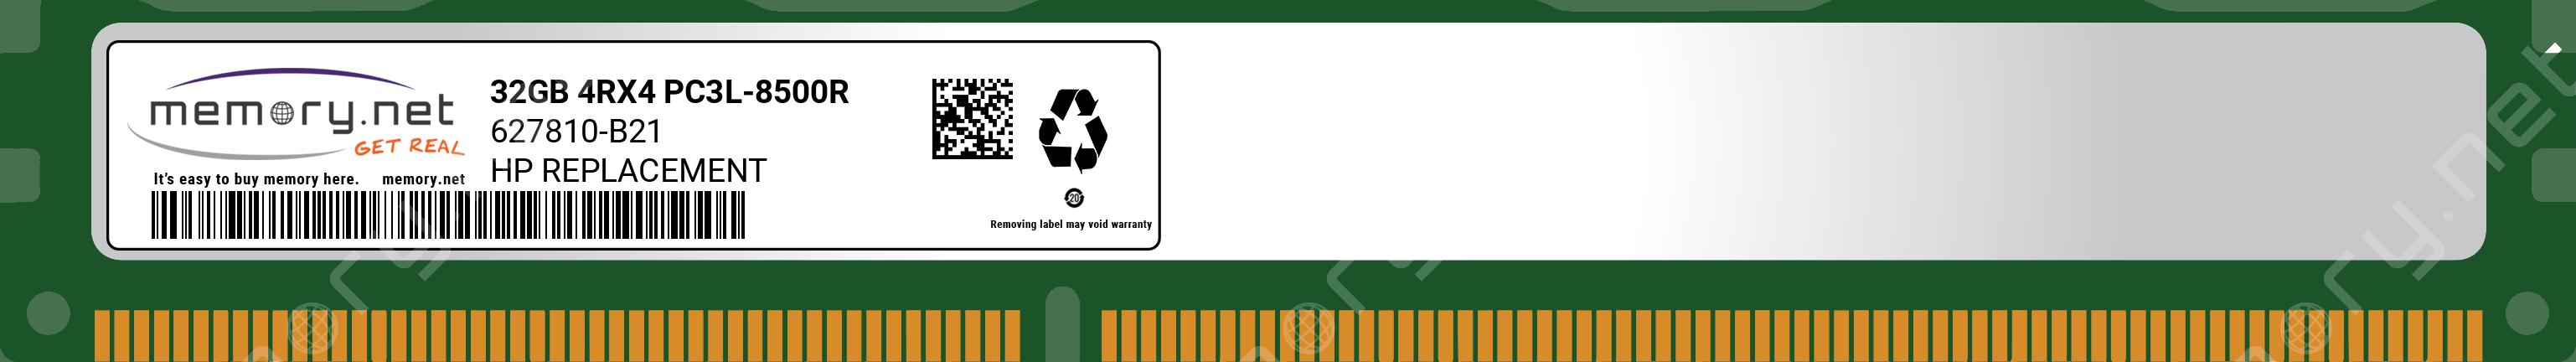 627810-B21